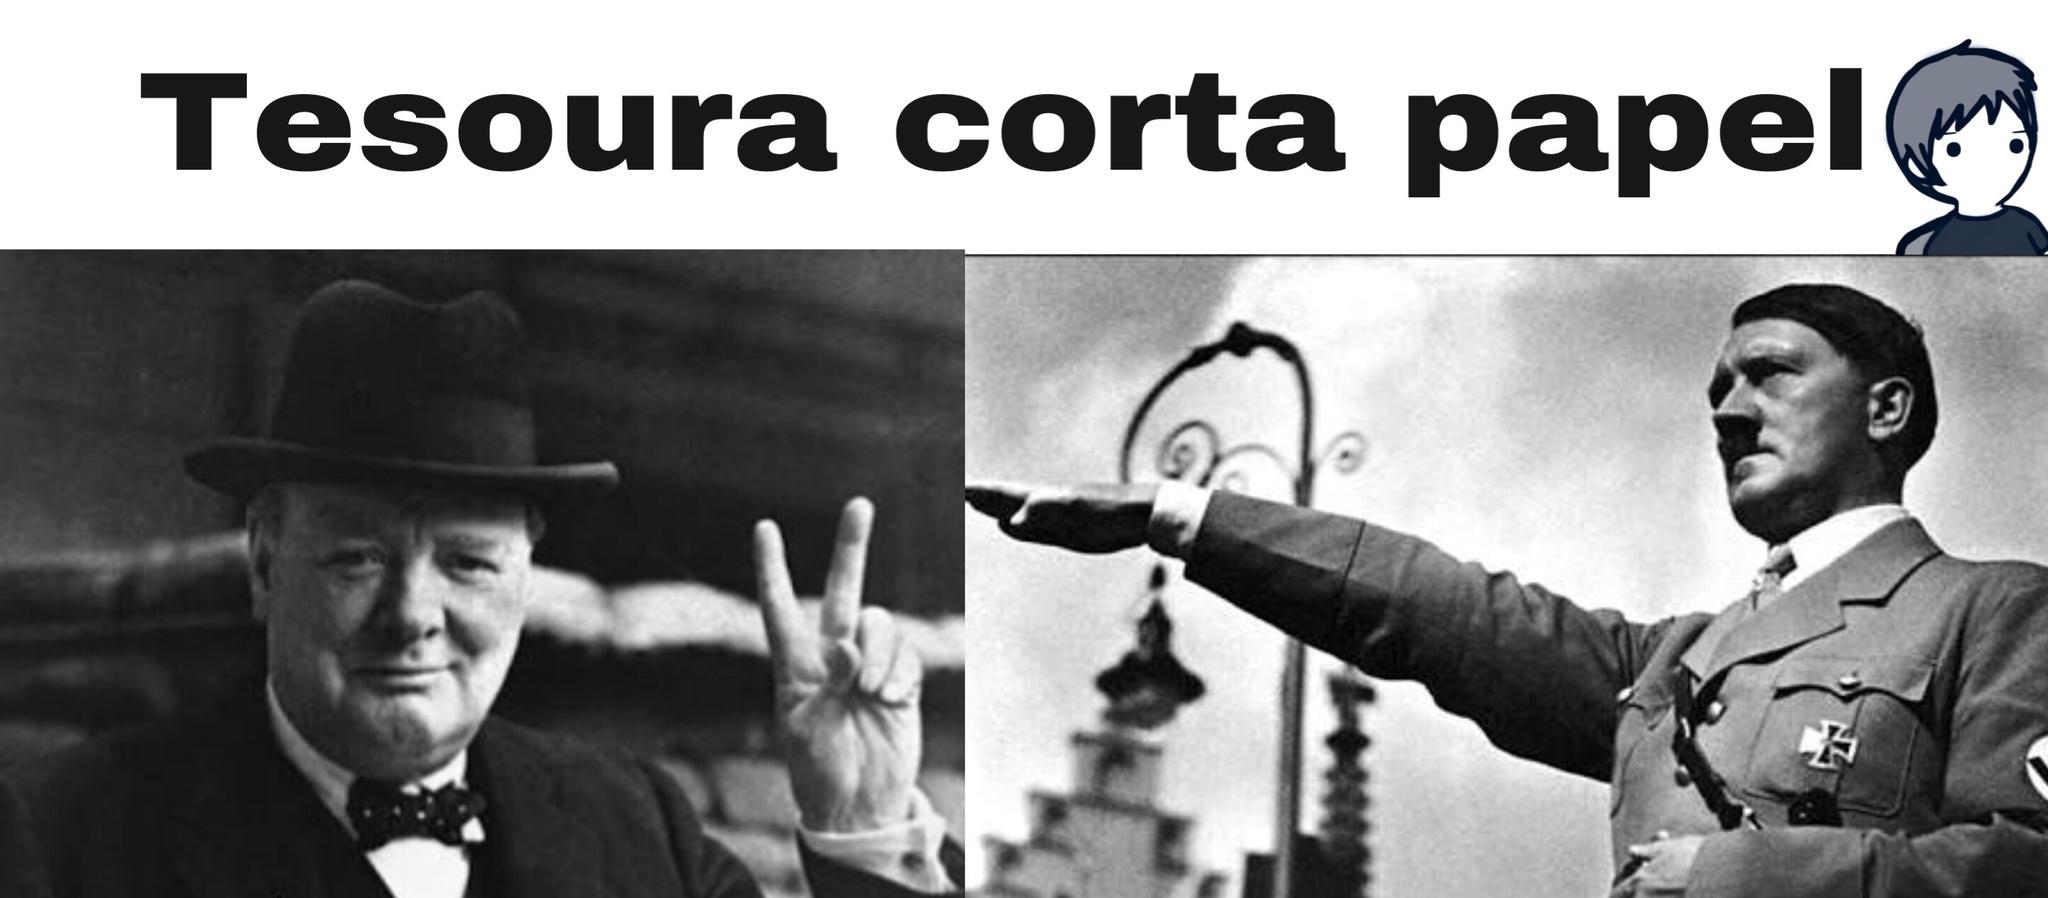 Piada_de_historia_1 - meme